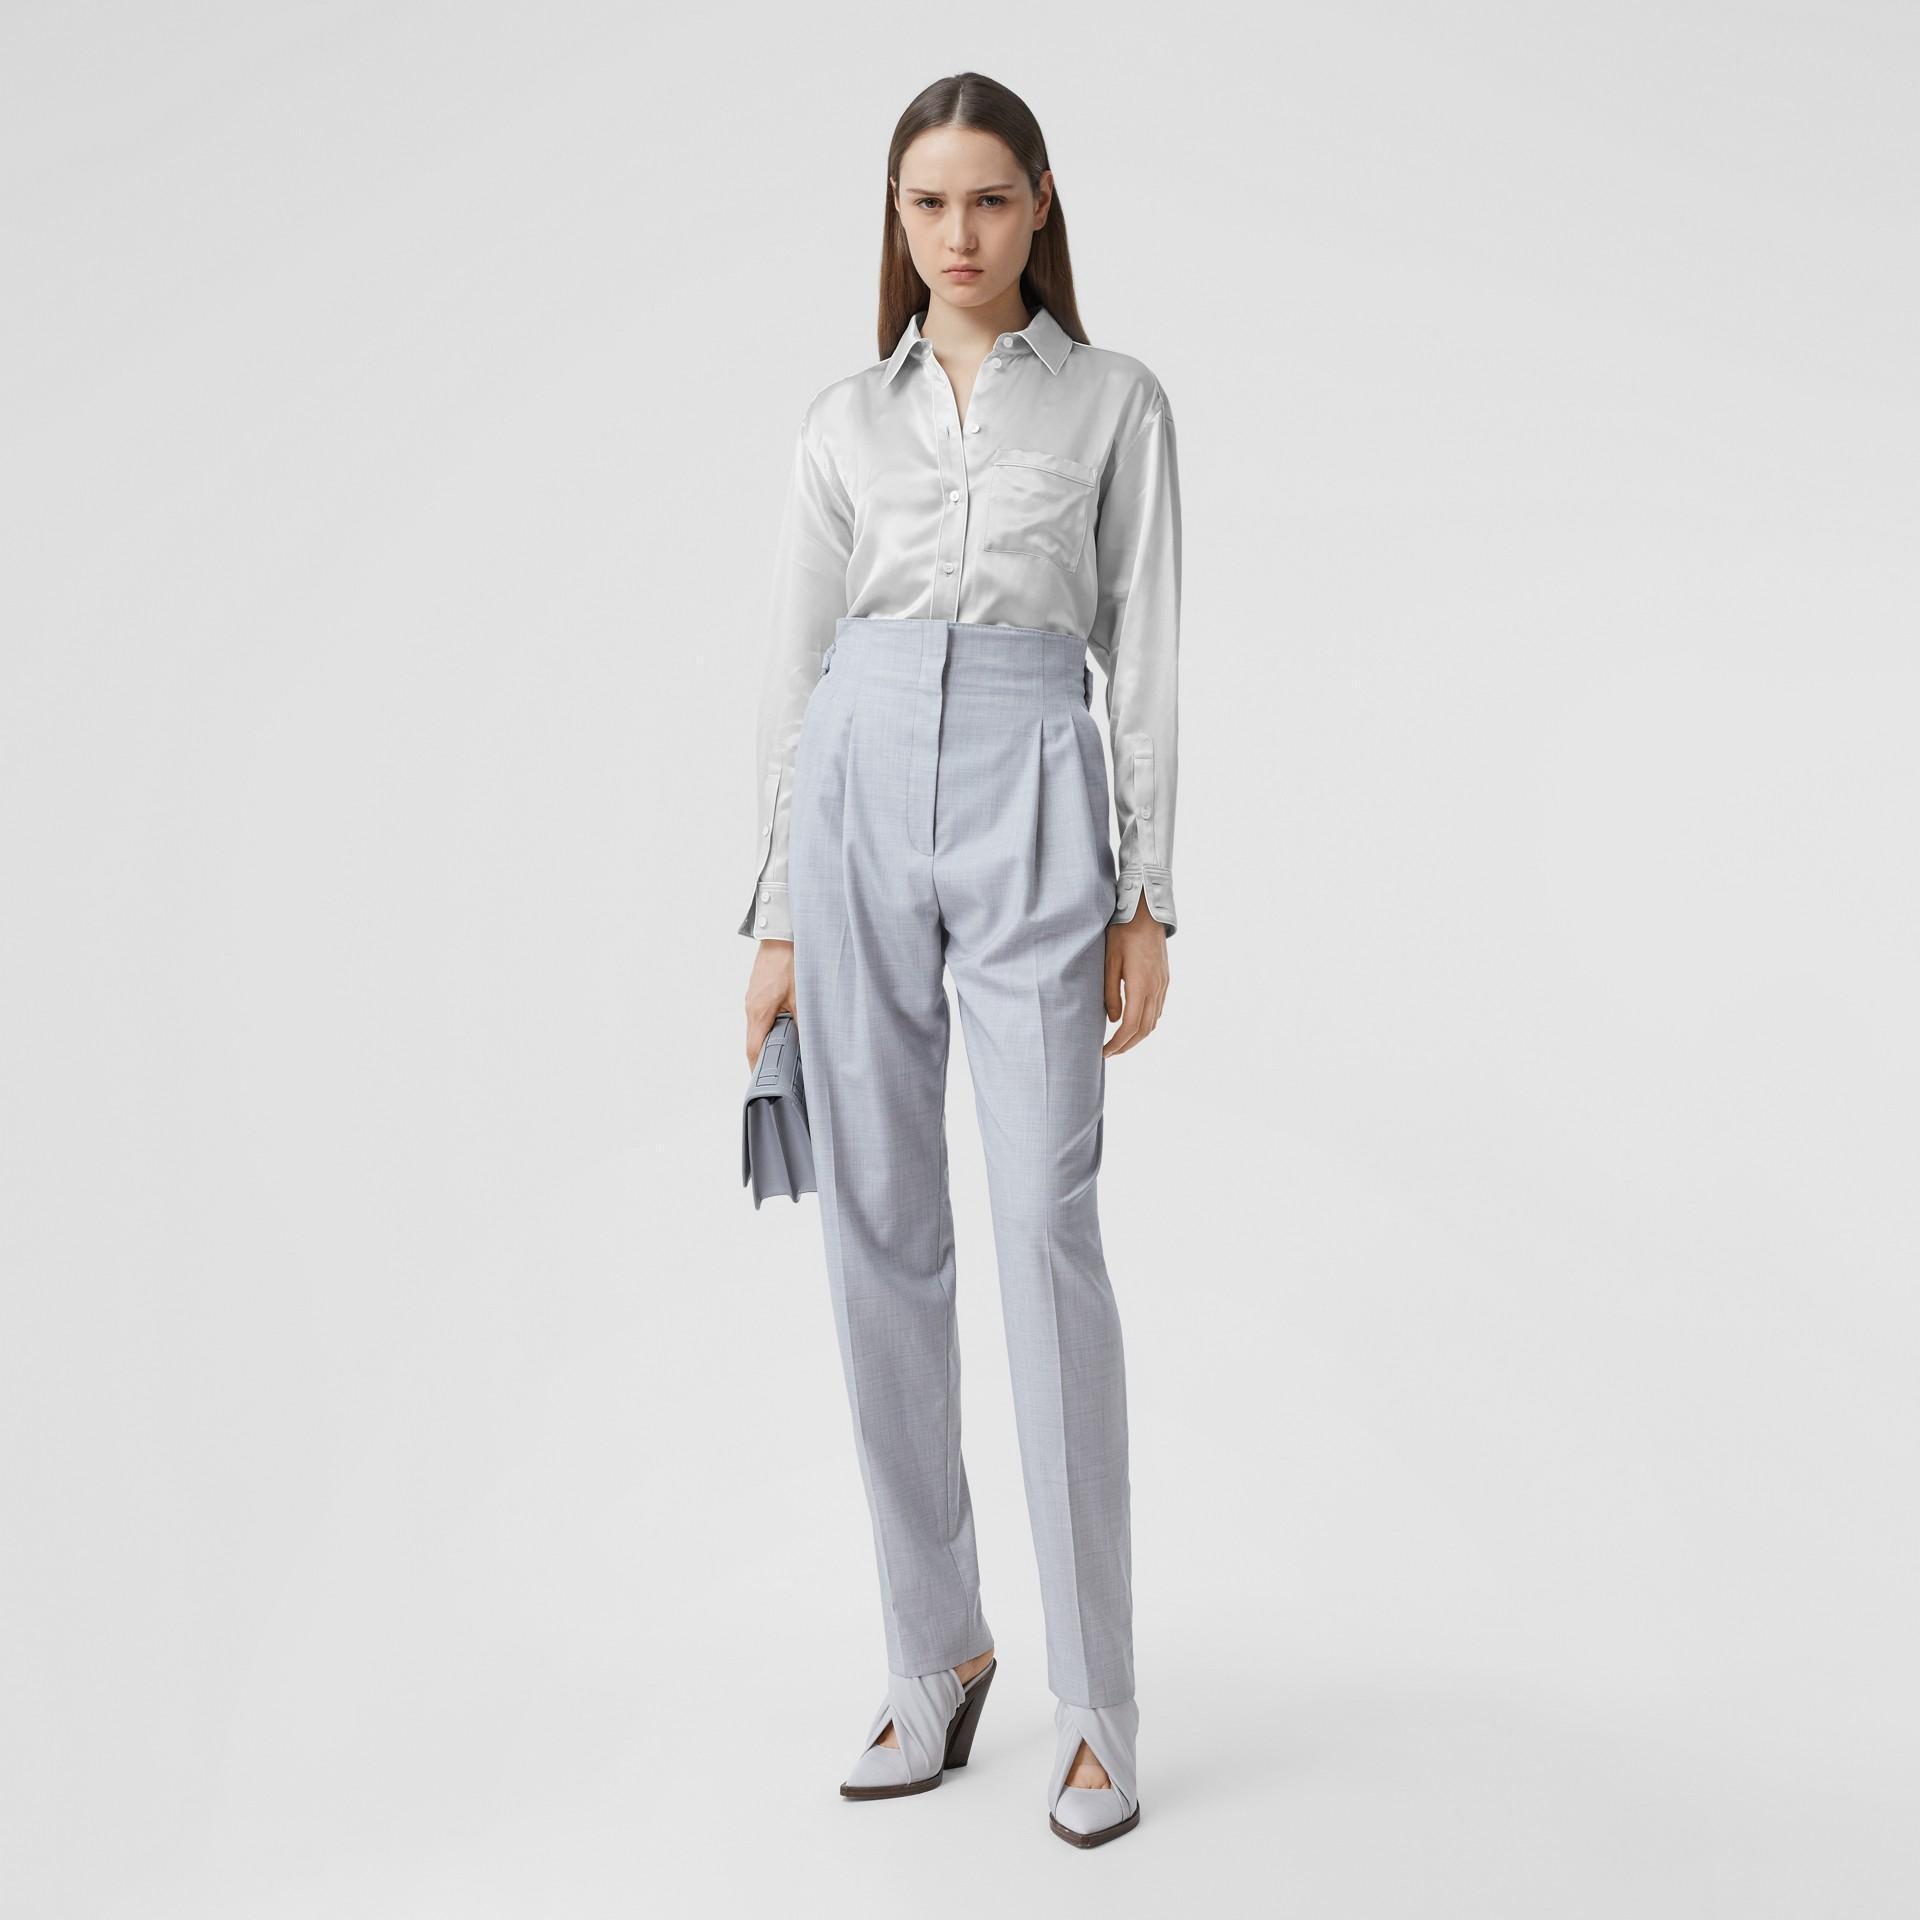 Silk Satin Shirt in Light Pebble Grey - Women | Burberry - gallery image 0